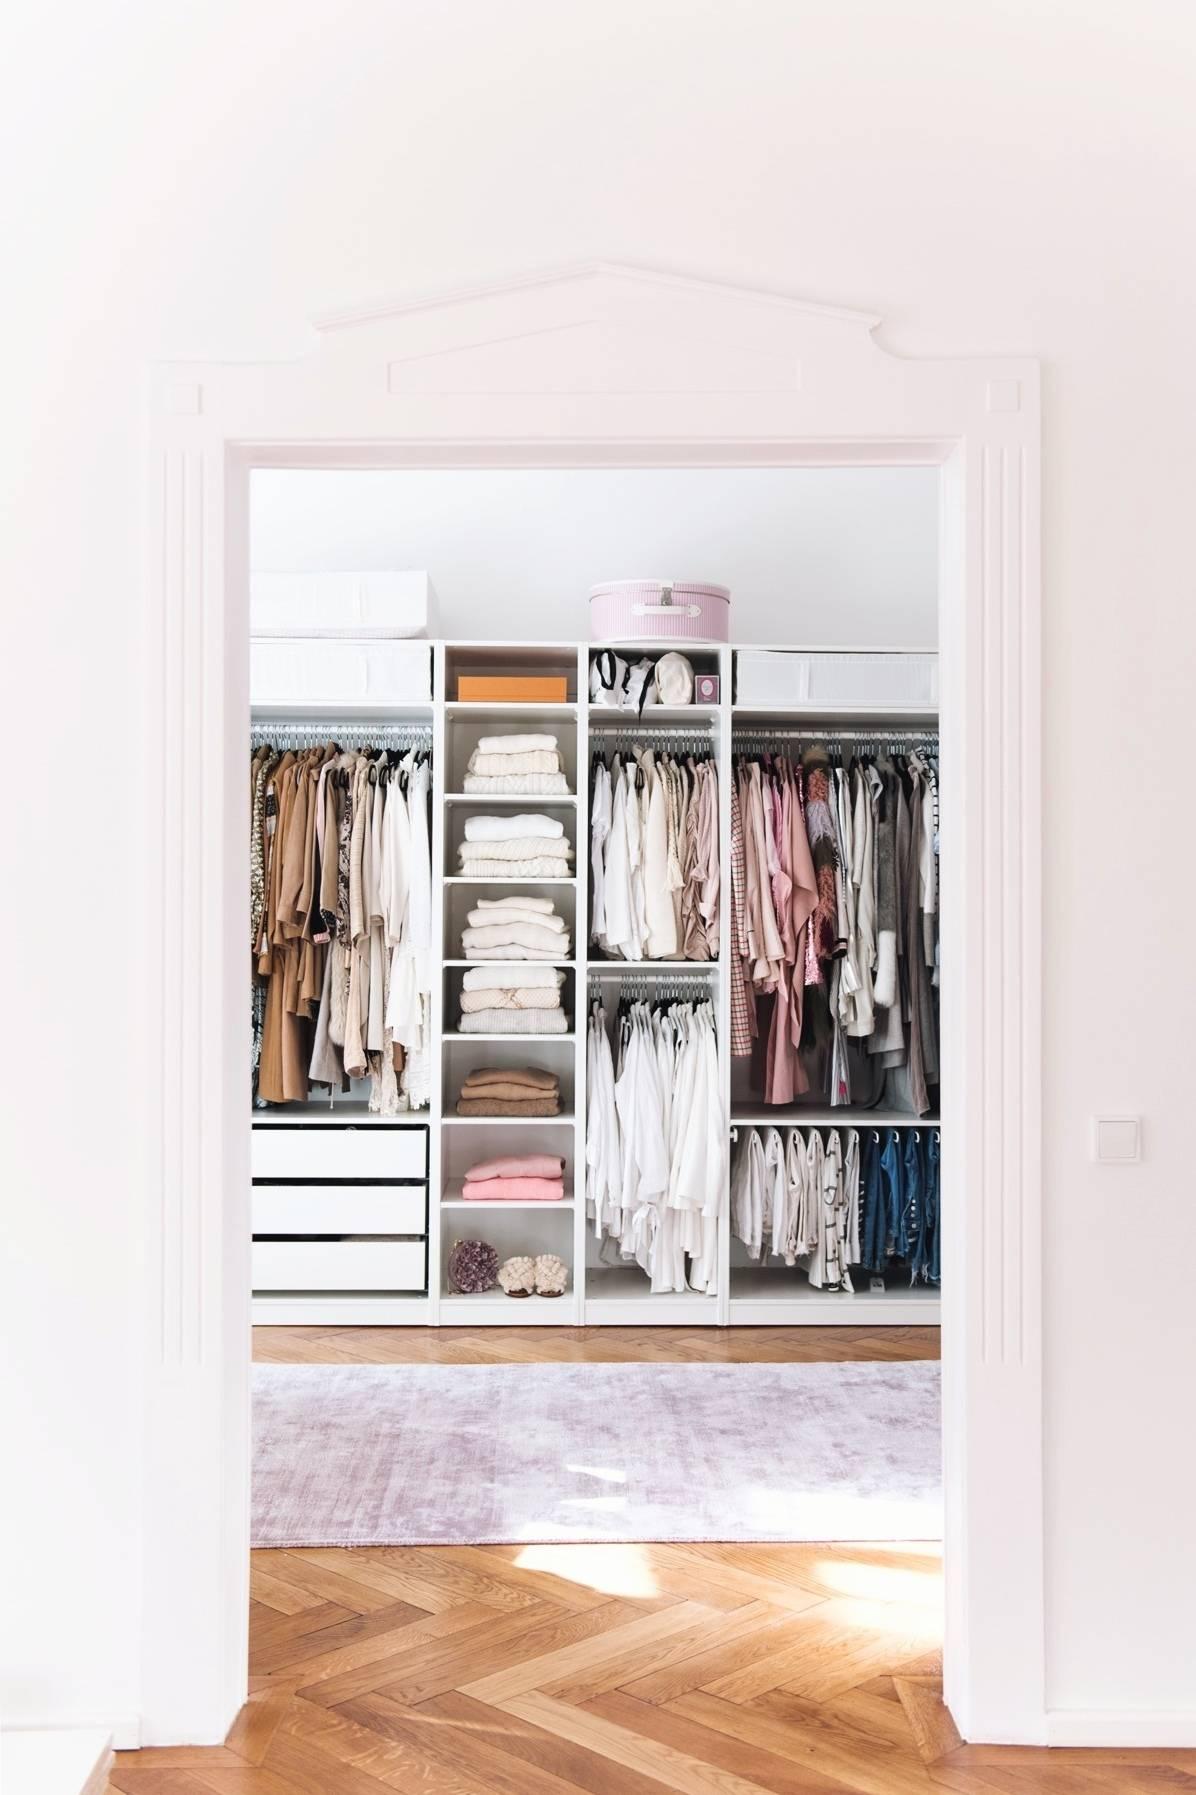 Fashiion Carpet IKEA PAX walk-in closet